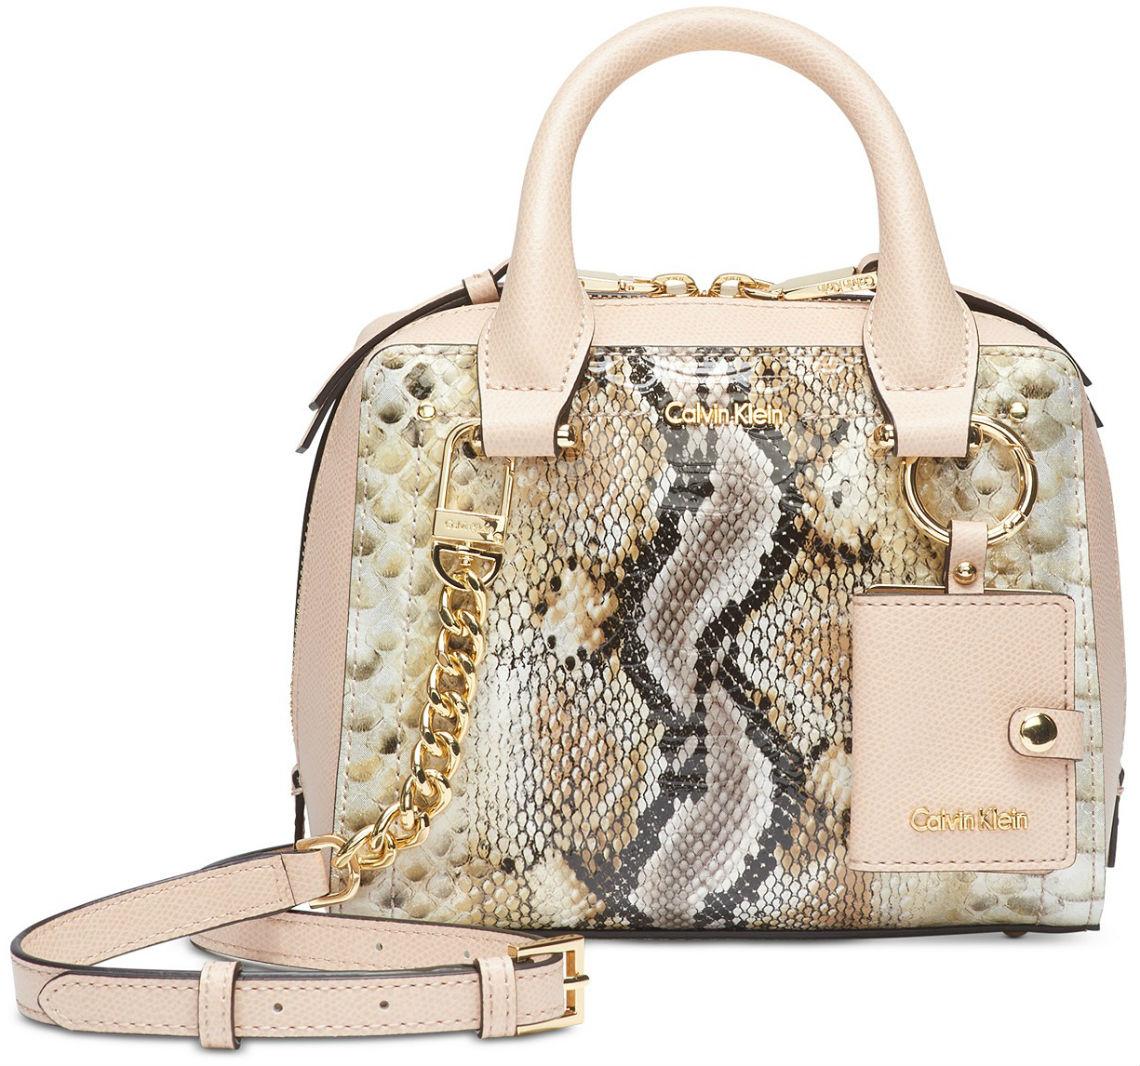 fa6d0eb55e6b Macys Clearance Designer Handbags